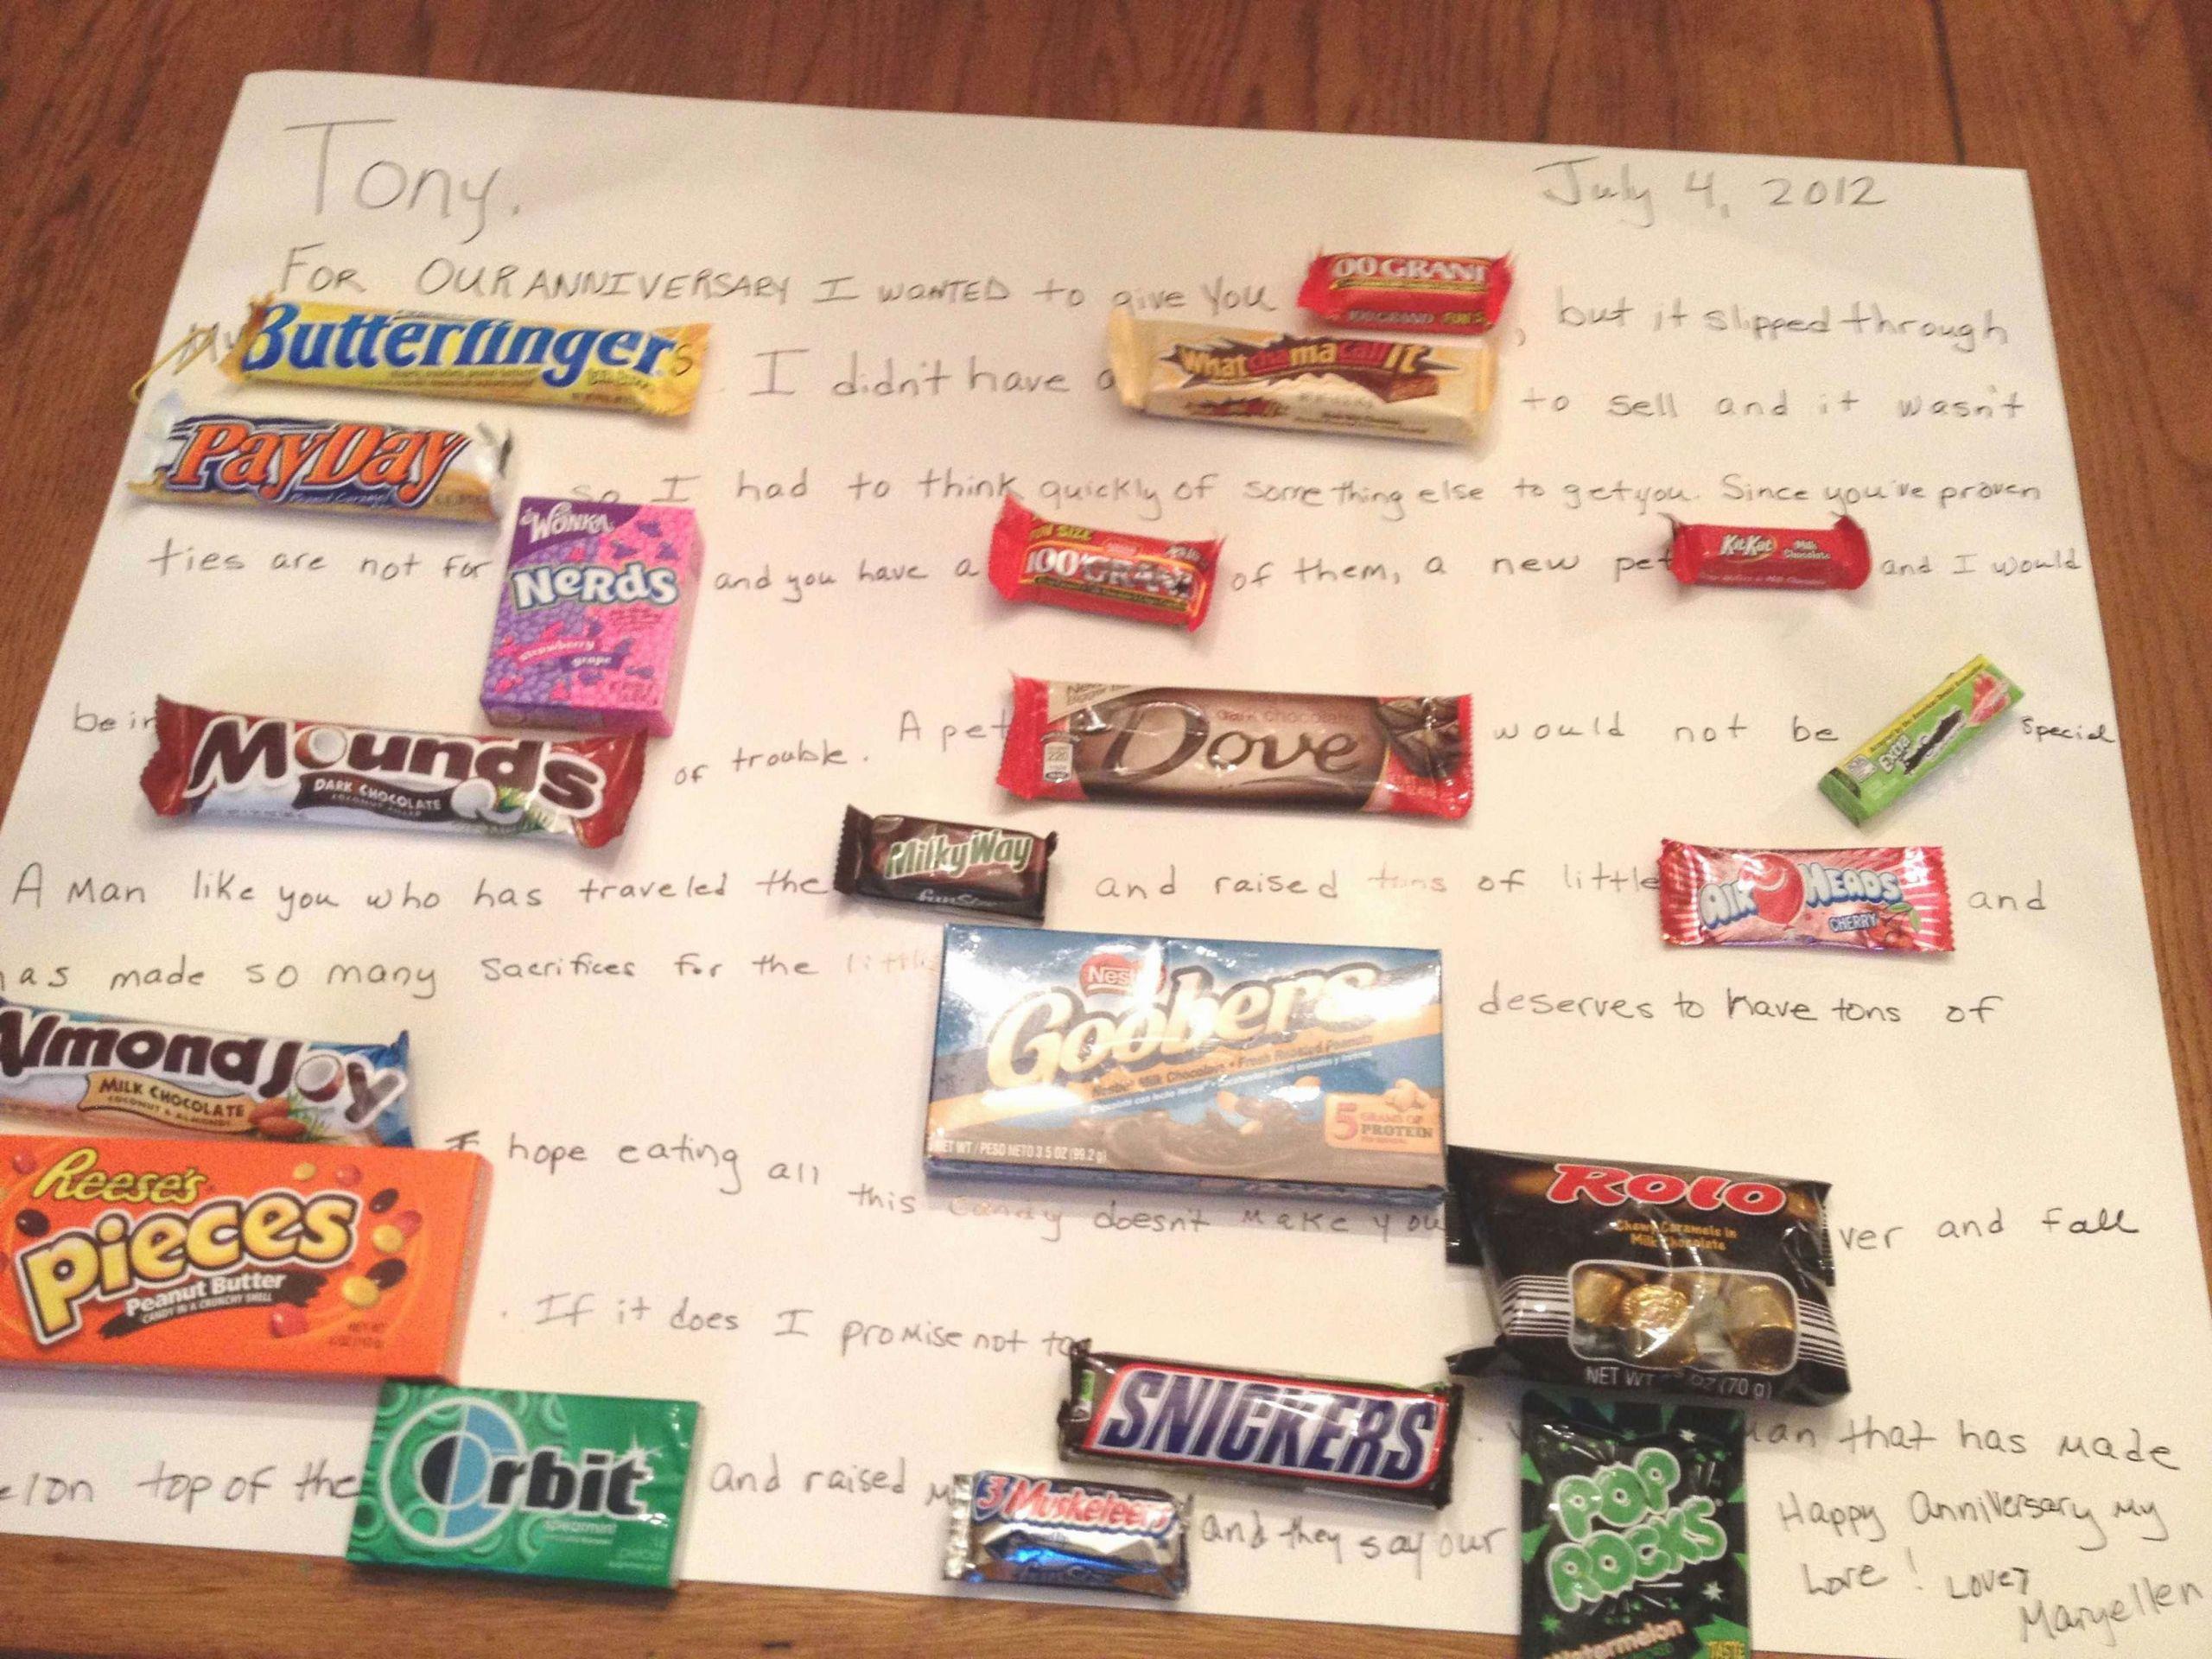 4Th Wedding Anniversary Gift Ideas For Him  15 year anniversary t ideas for her